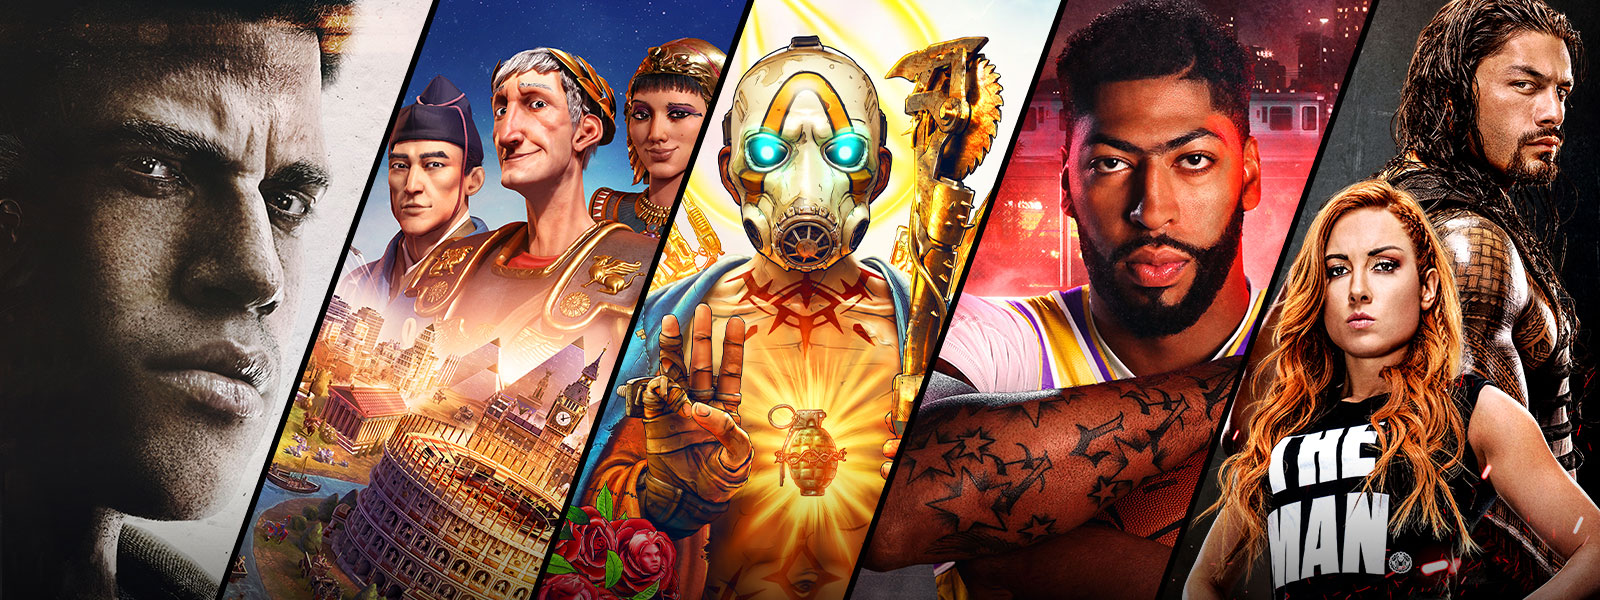 2K games on sale include Sid Meier's Civilization, Borderlands 3, and NBA 2K20.